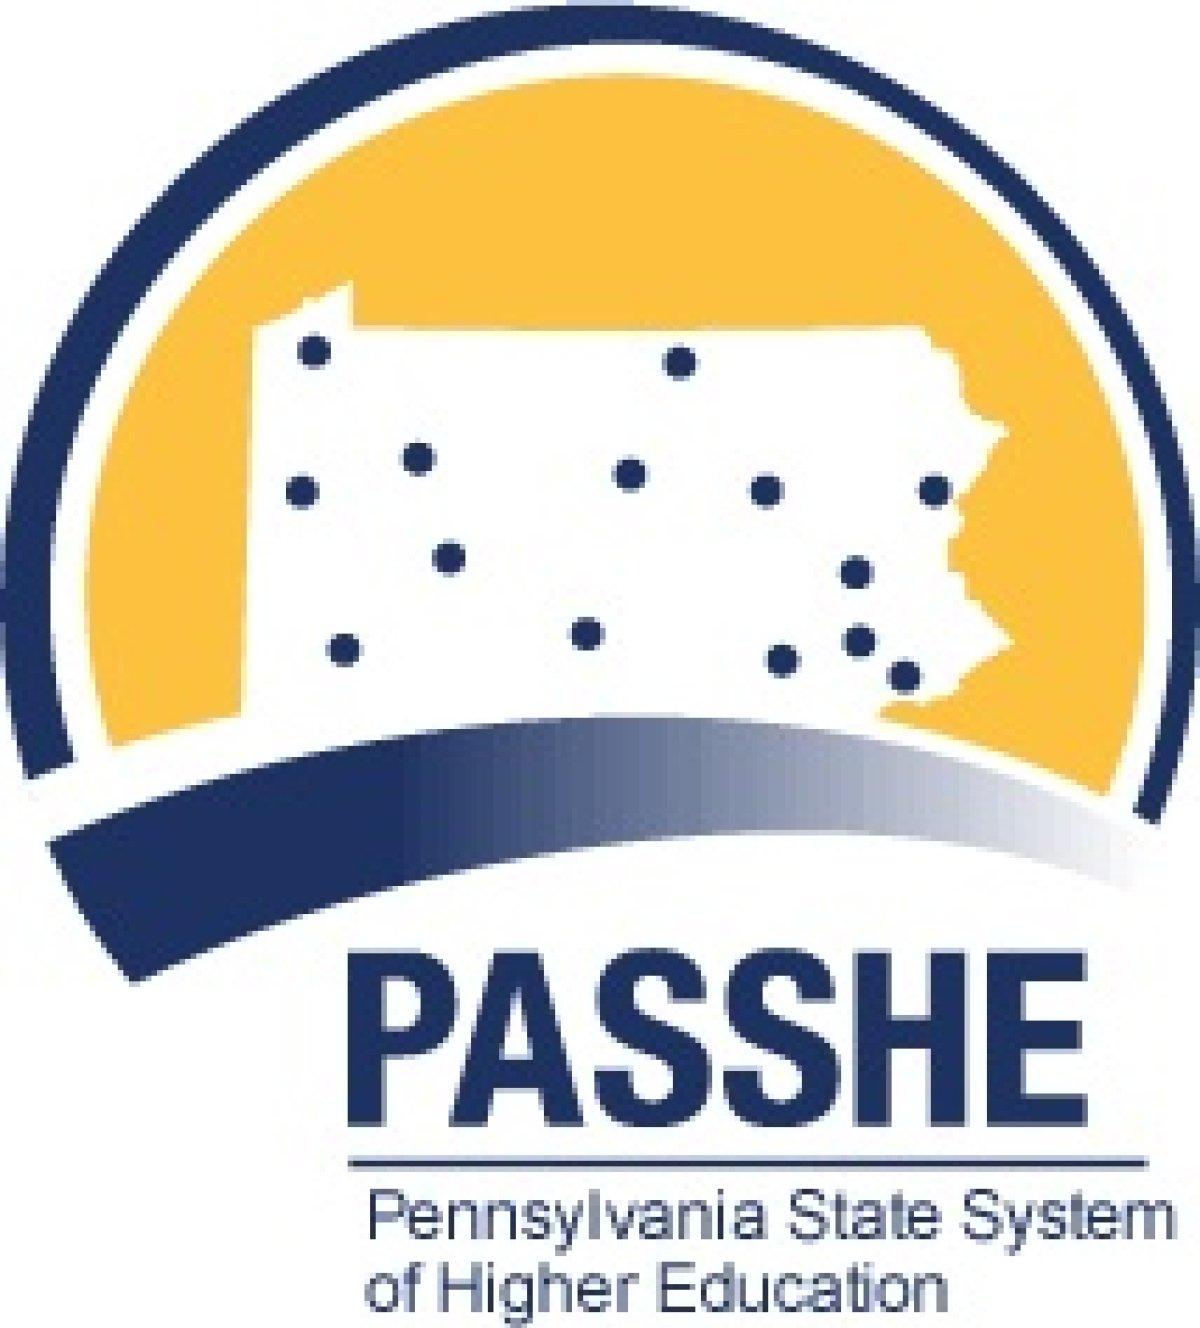 Pennsylvania-State-System-of-Higher-Education-PASSHE-31.jpg